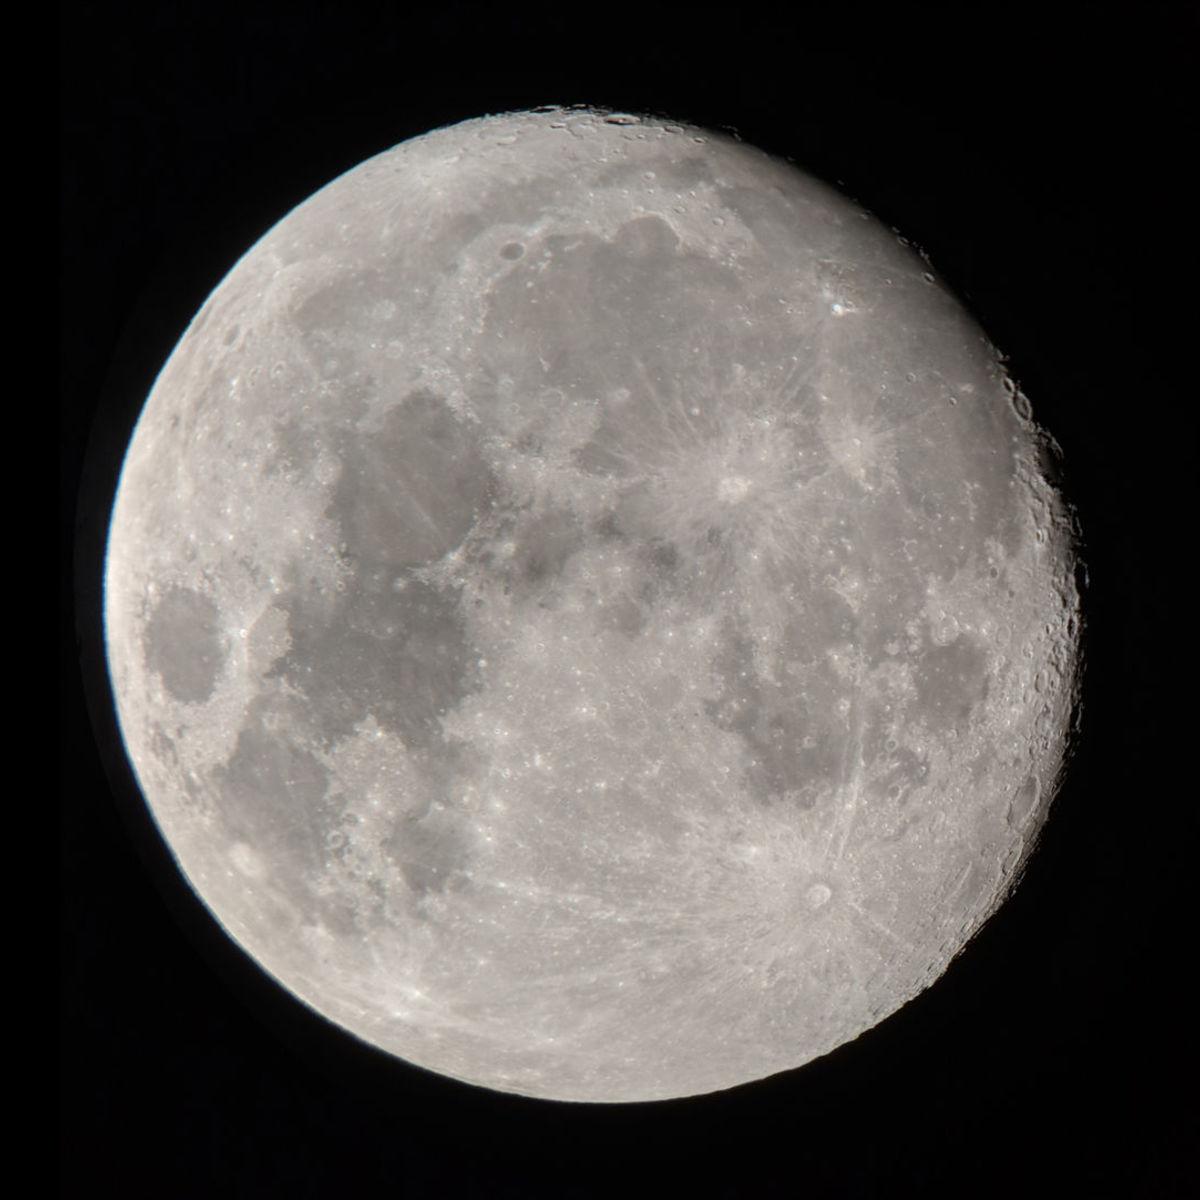 Moons can have moons, but it isn't easy. Credit: Moon: Phil Plait; Vesta: NASA/JPL-Caltech/UCAL/MPS/DLR/IDA